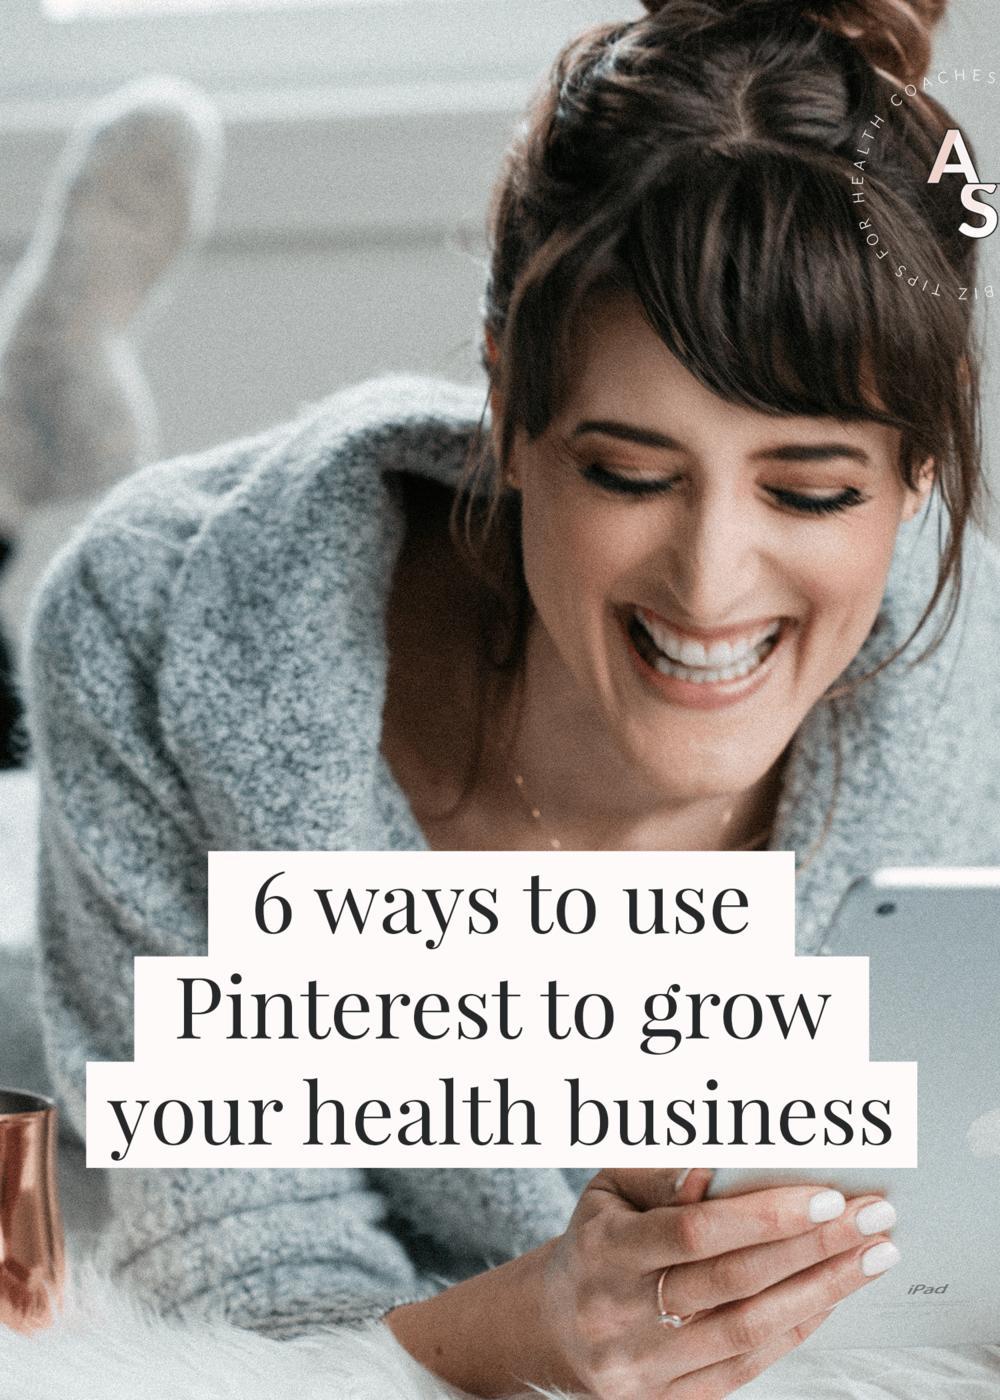 6 ways to use Pinterest to grow your health business! #HealthyLiving #Pinterest #SocialMedia #HealthandWellness #HealthBusinessTips